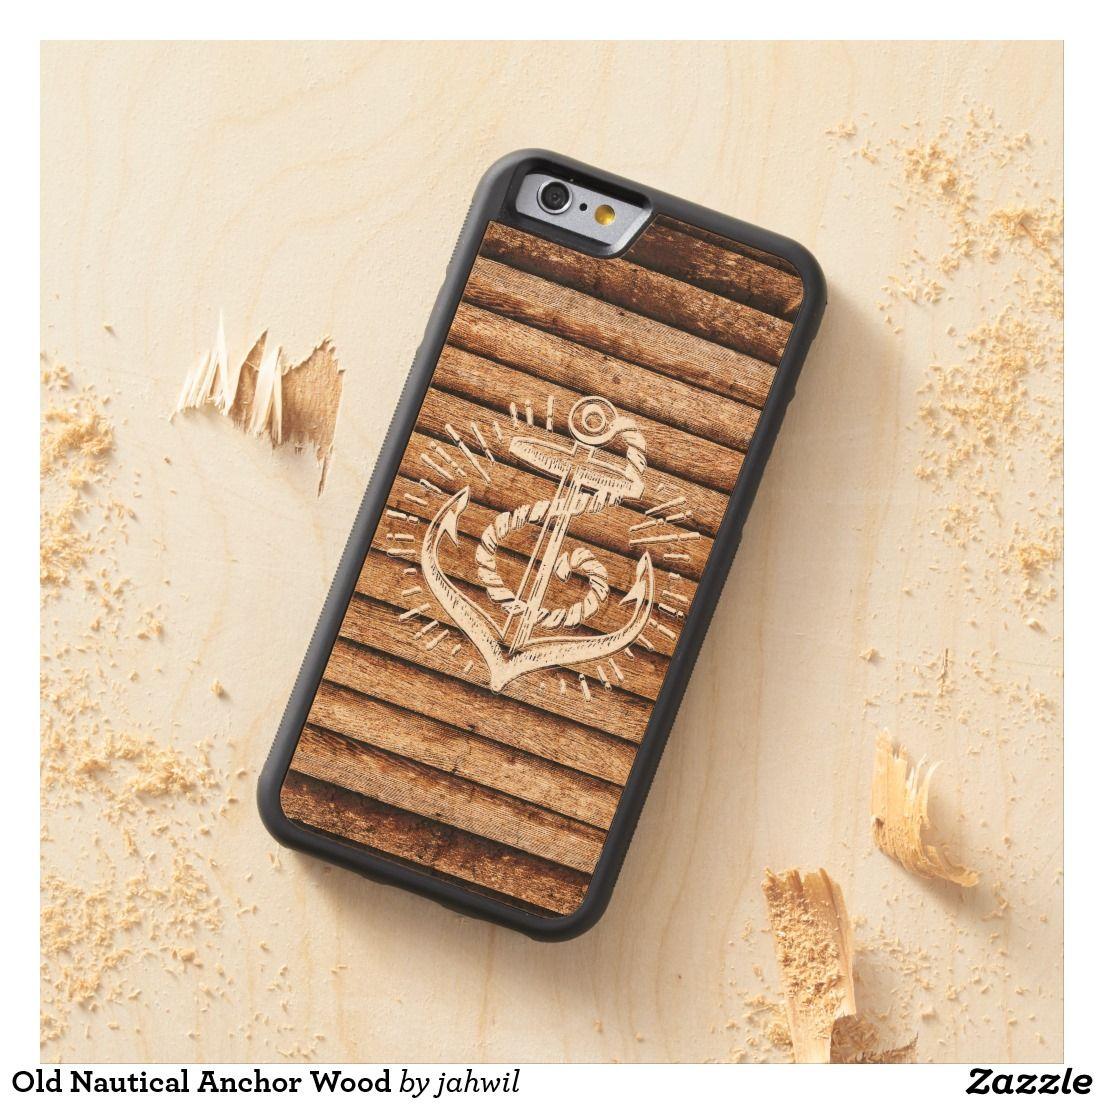 #sailor #oldnauticalanchor #woodanchor #woodcase #iphonecase #grafikprod Old Nautical Anchor Wood Carved® Maple iPhone 6 Bumper